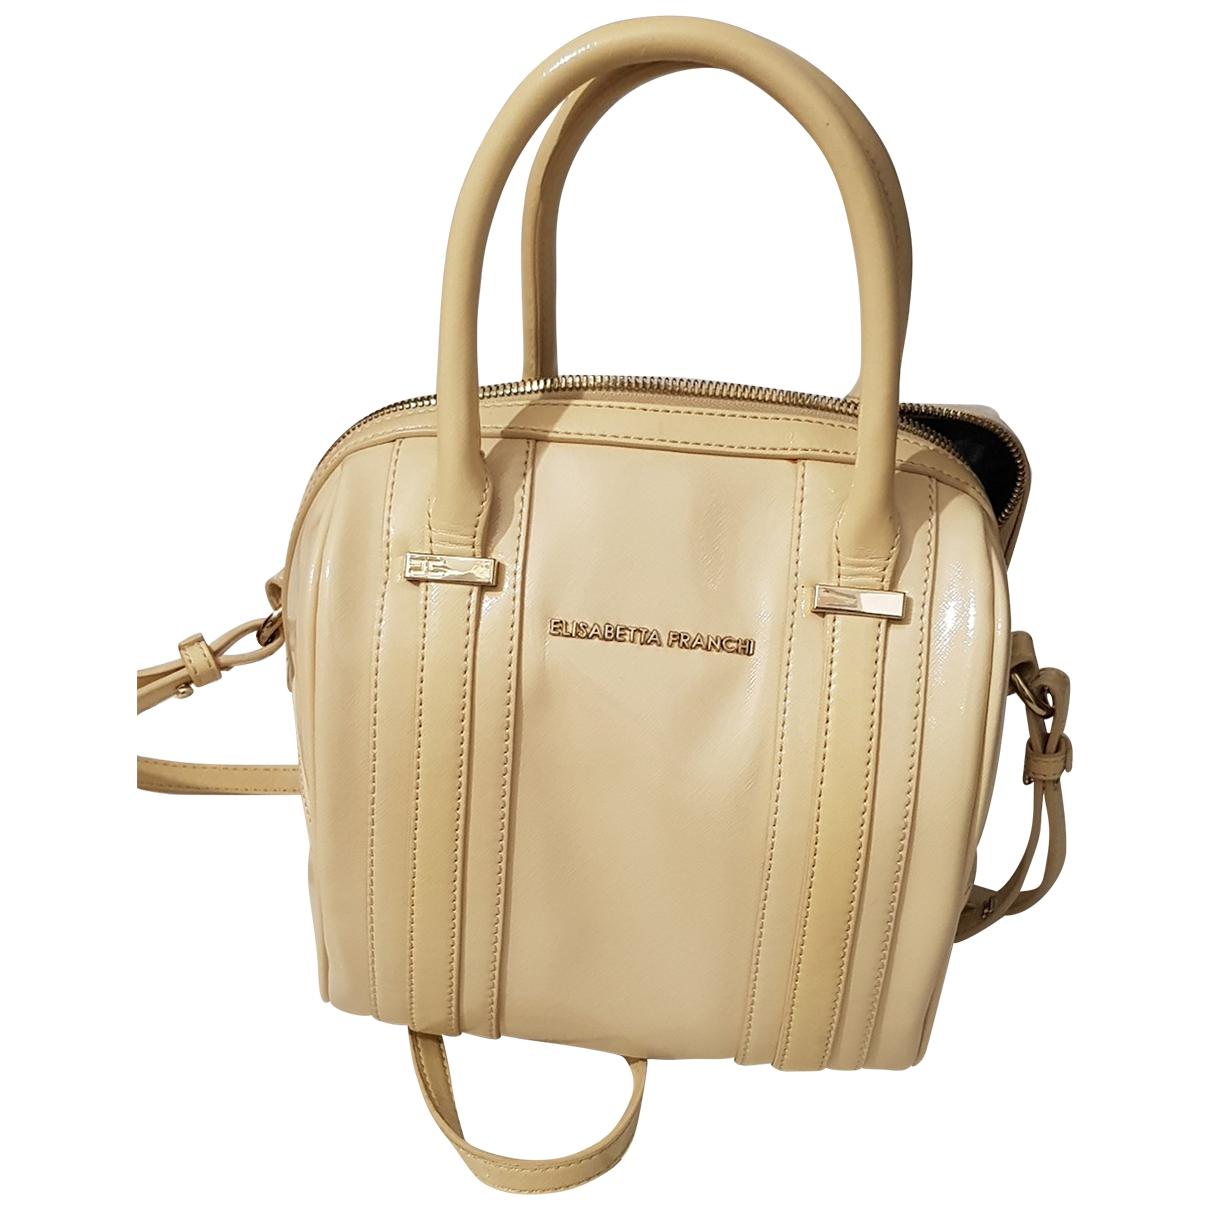 Elisabetta Franchi \N Handtasche in  Beige Lackleder